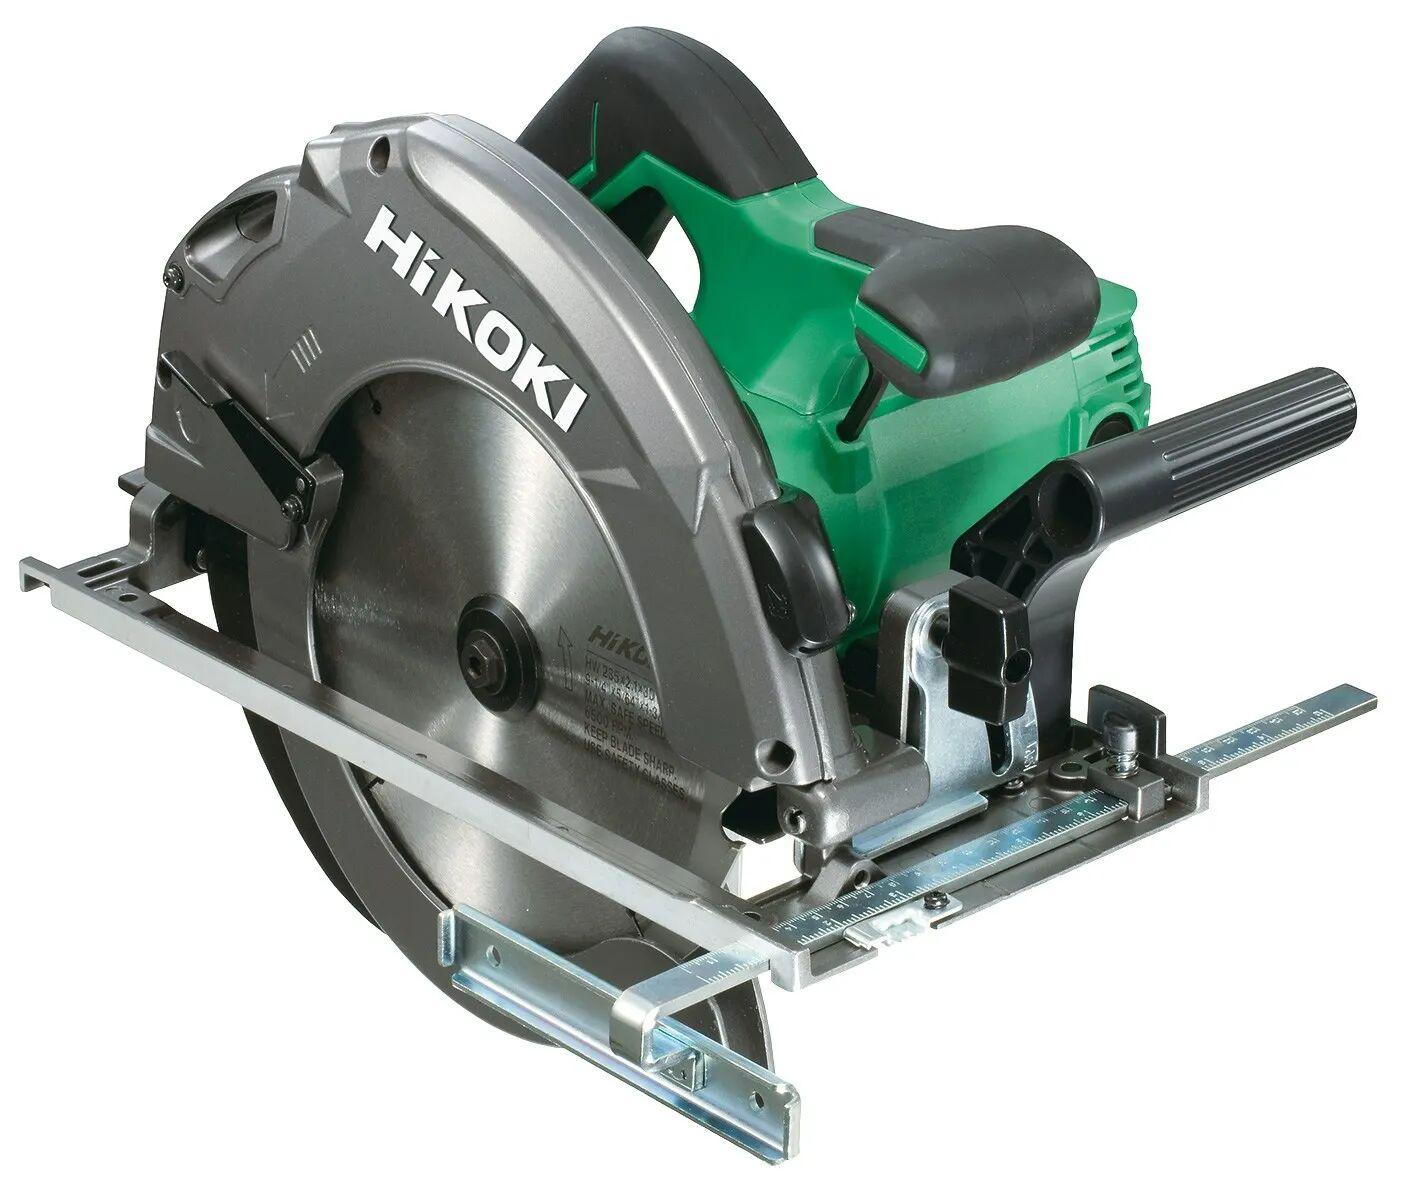 Hikoki Scie circulaire - lame Ø 235 mm - 2000 W - 86 mm